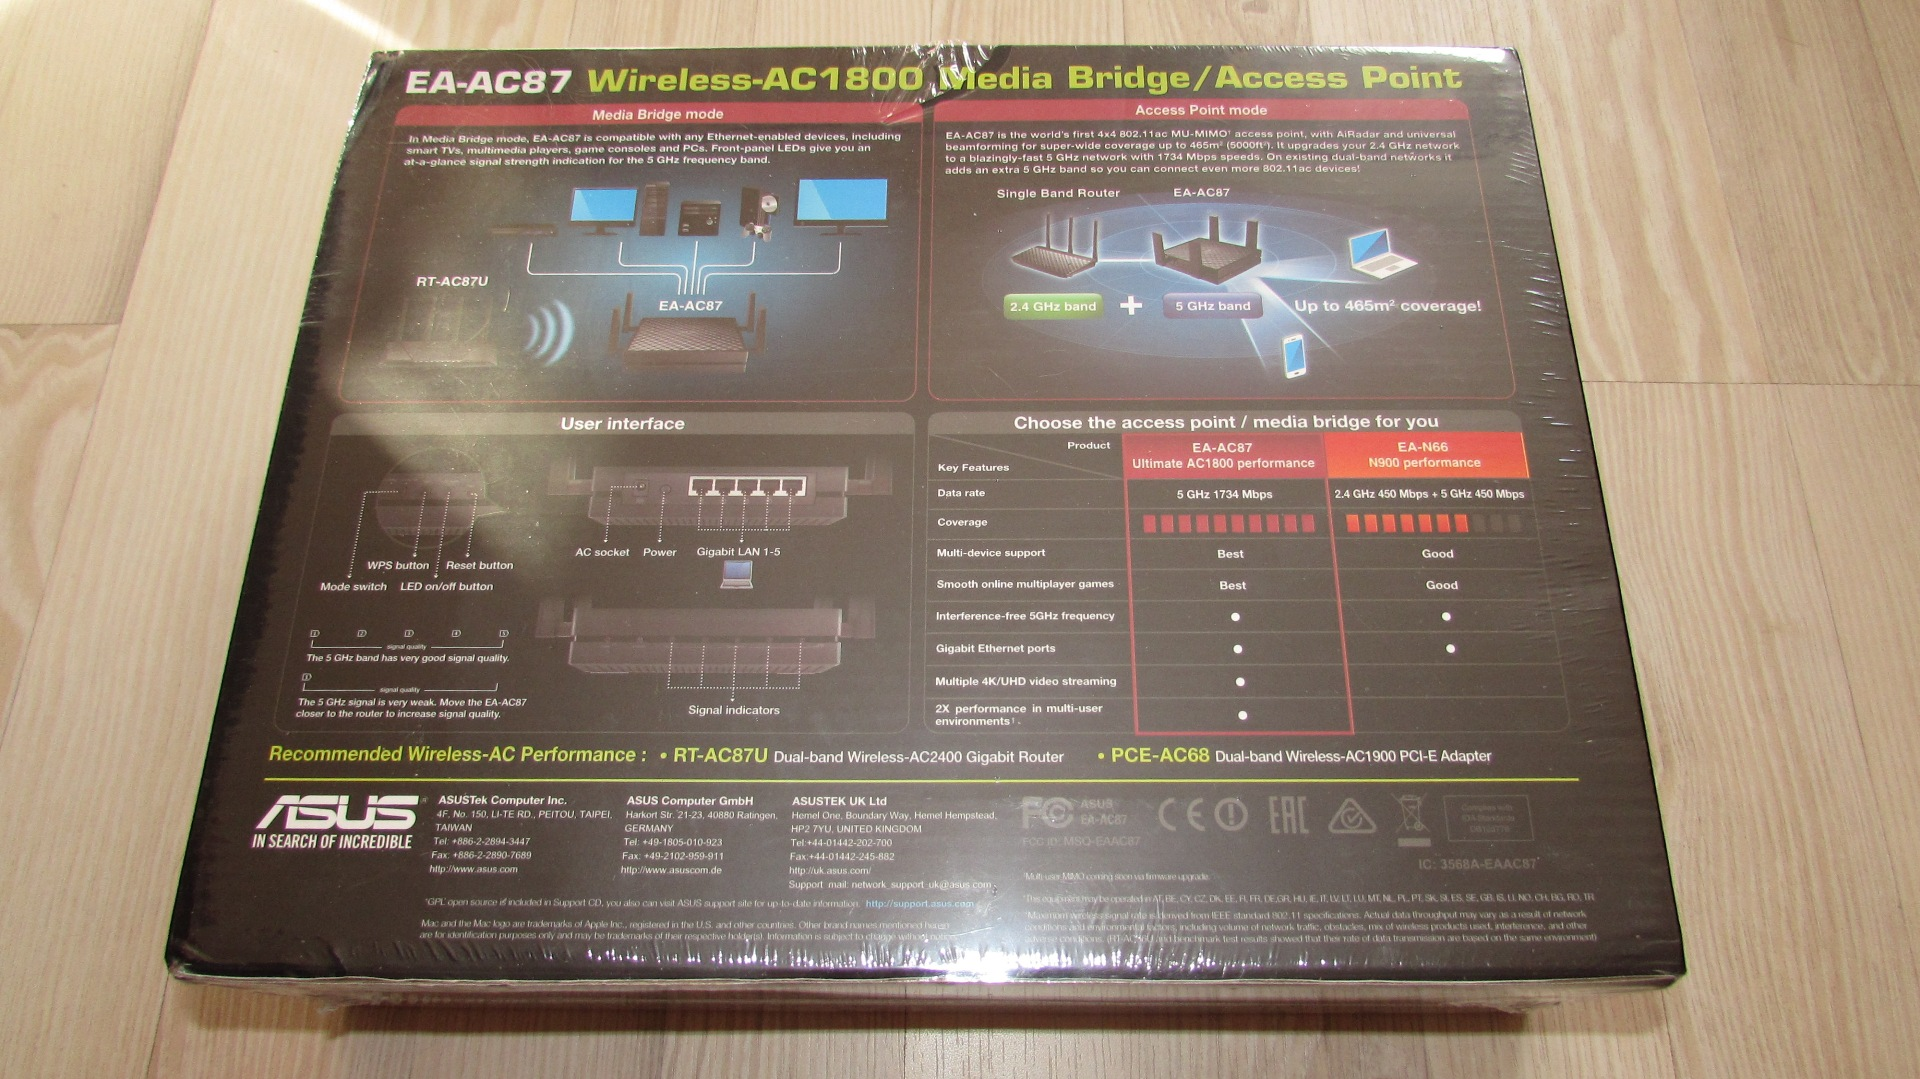 openlinksys.info/images/EA-AC87/IMG_0154.JPG